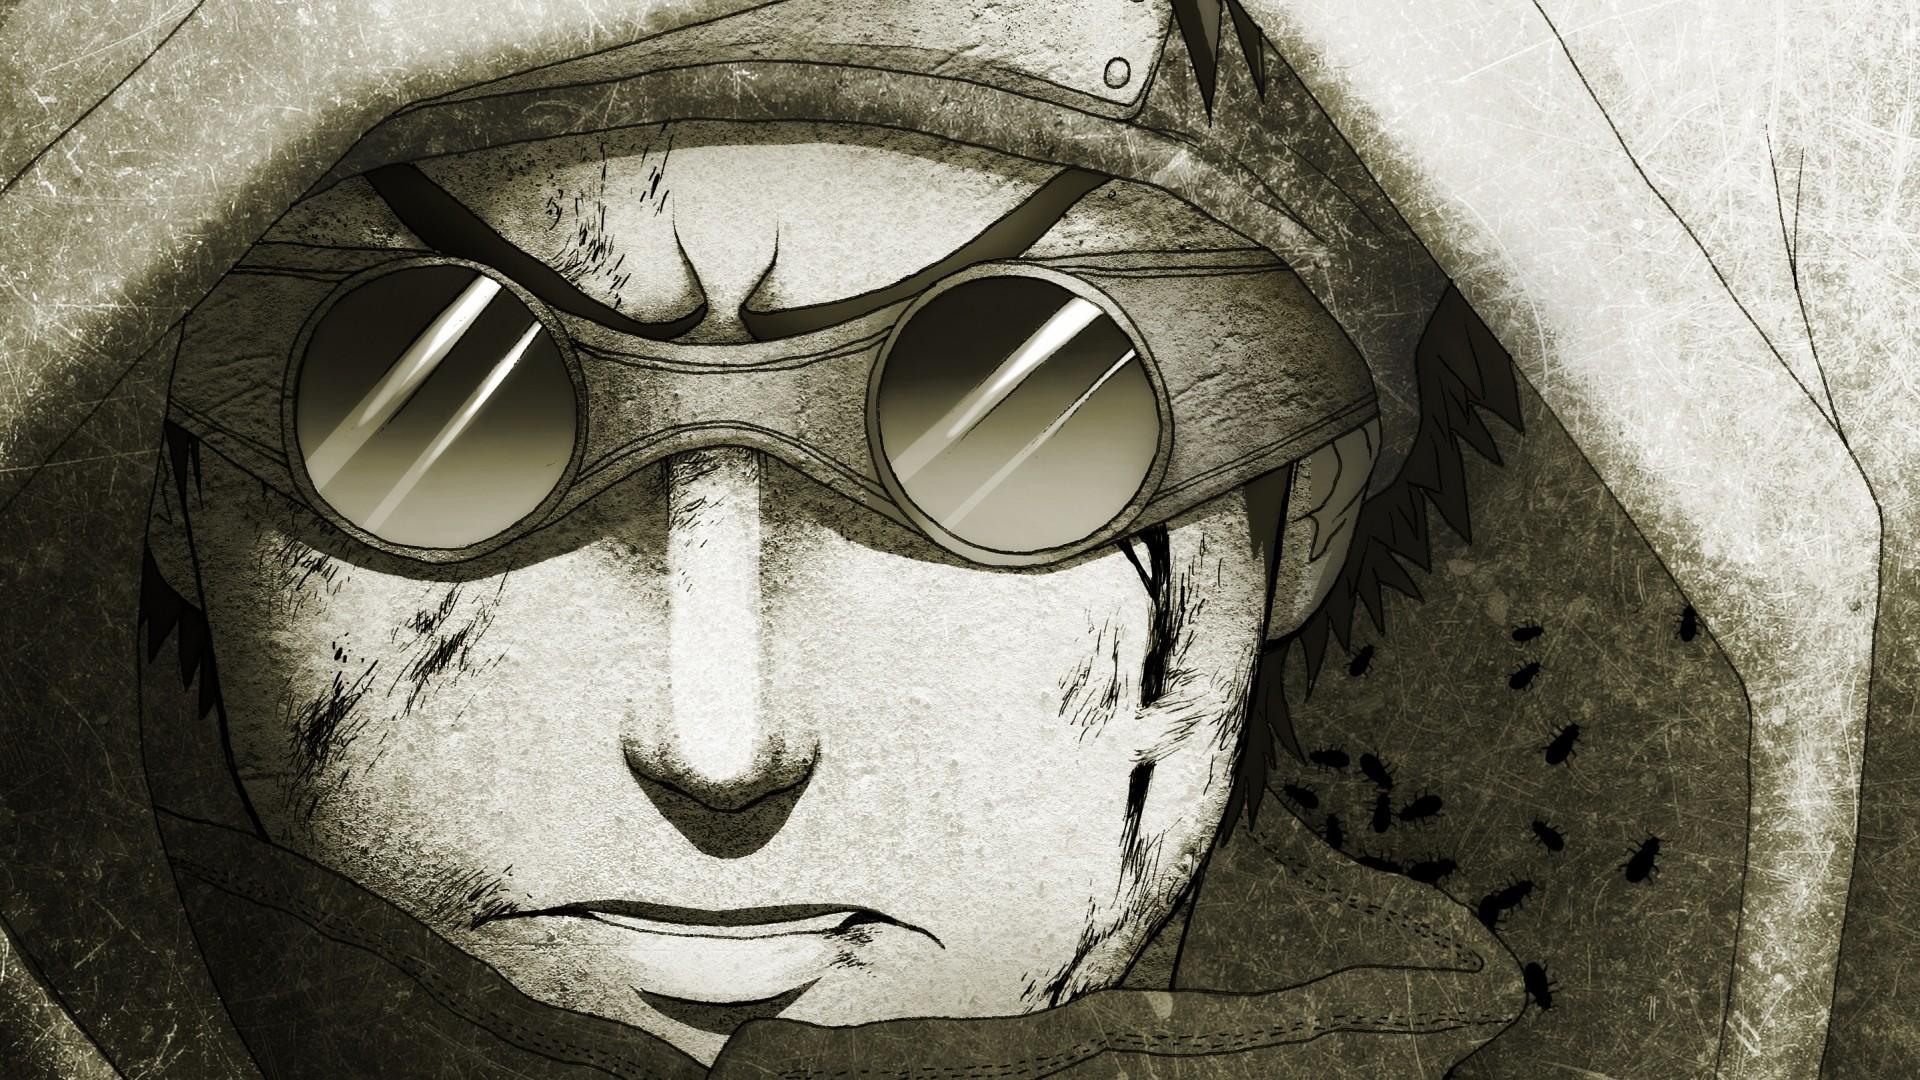 … Background Full HD 1080p. Wallpaper linnyxito, drawing, naruto,  aburame shino, guy